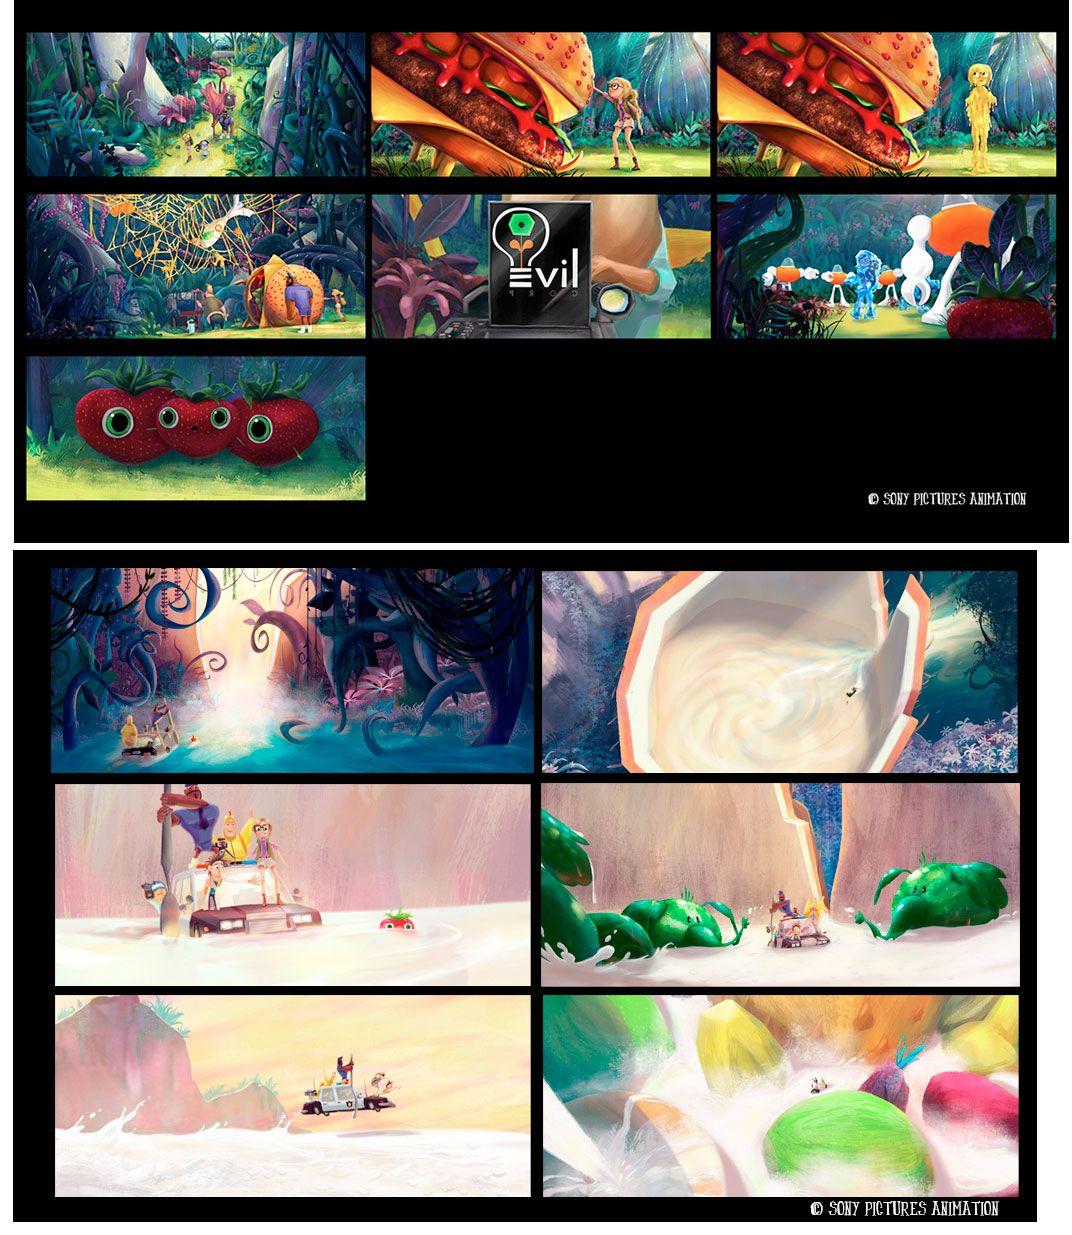 Arte de Samantha Kallis para o filme Cloudy 2